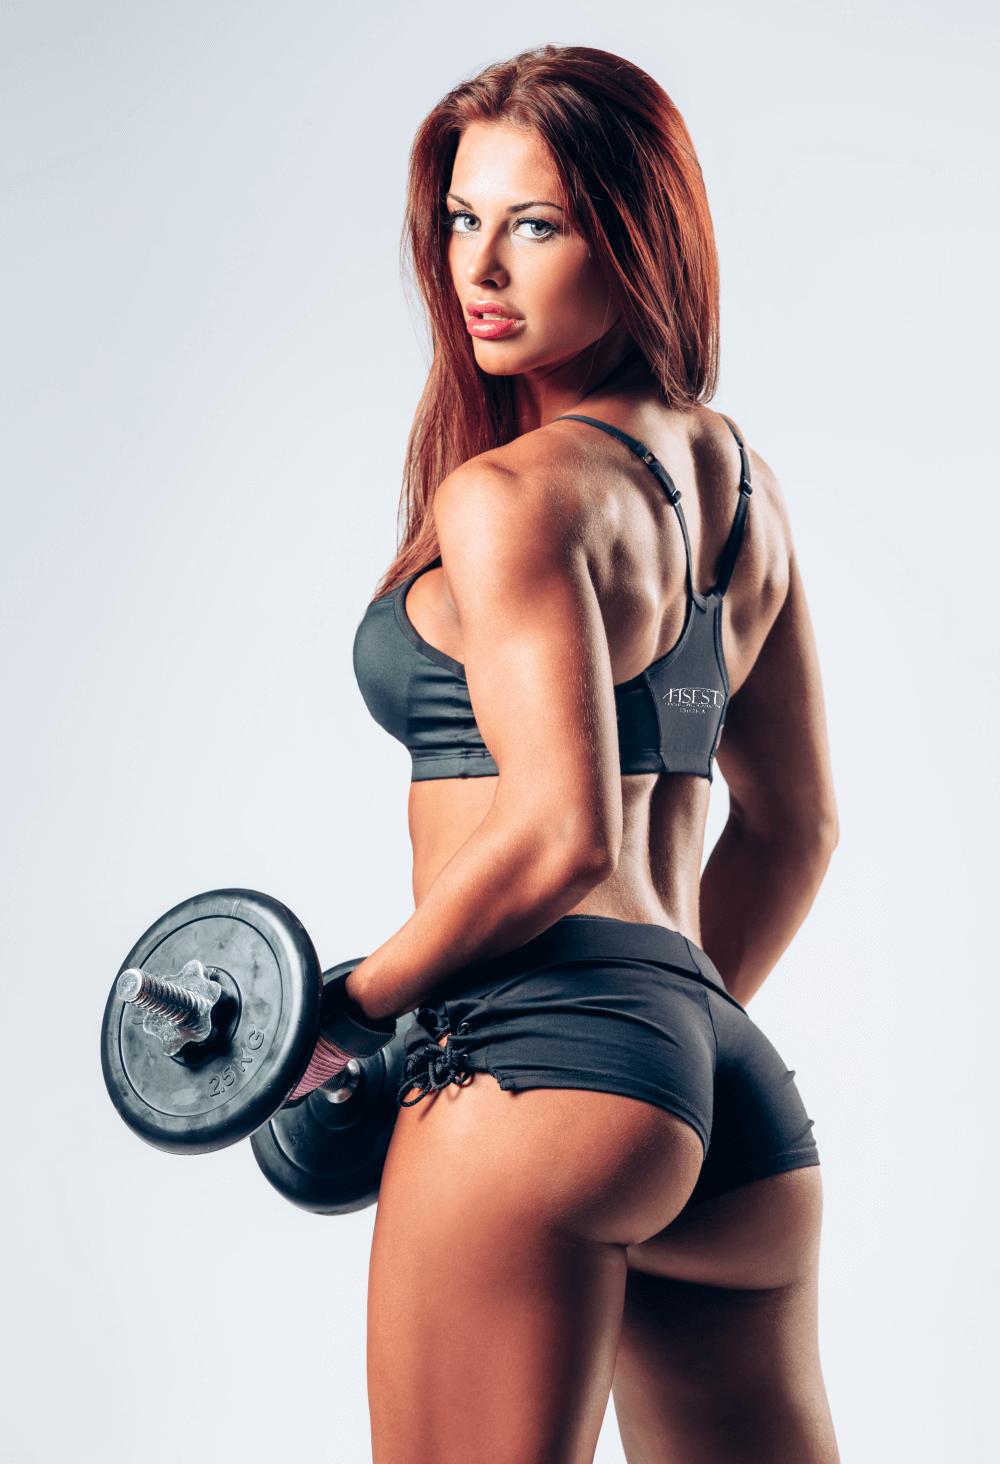 Sou-Fitness-Fisest-Campinas (1)